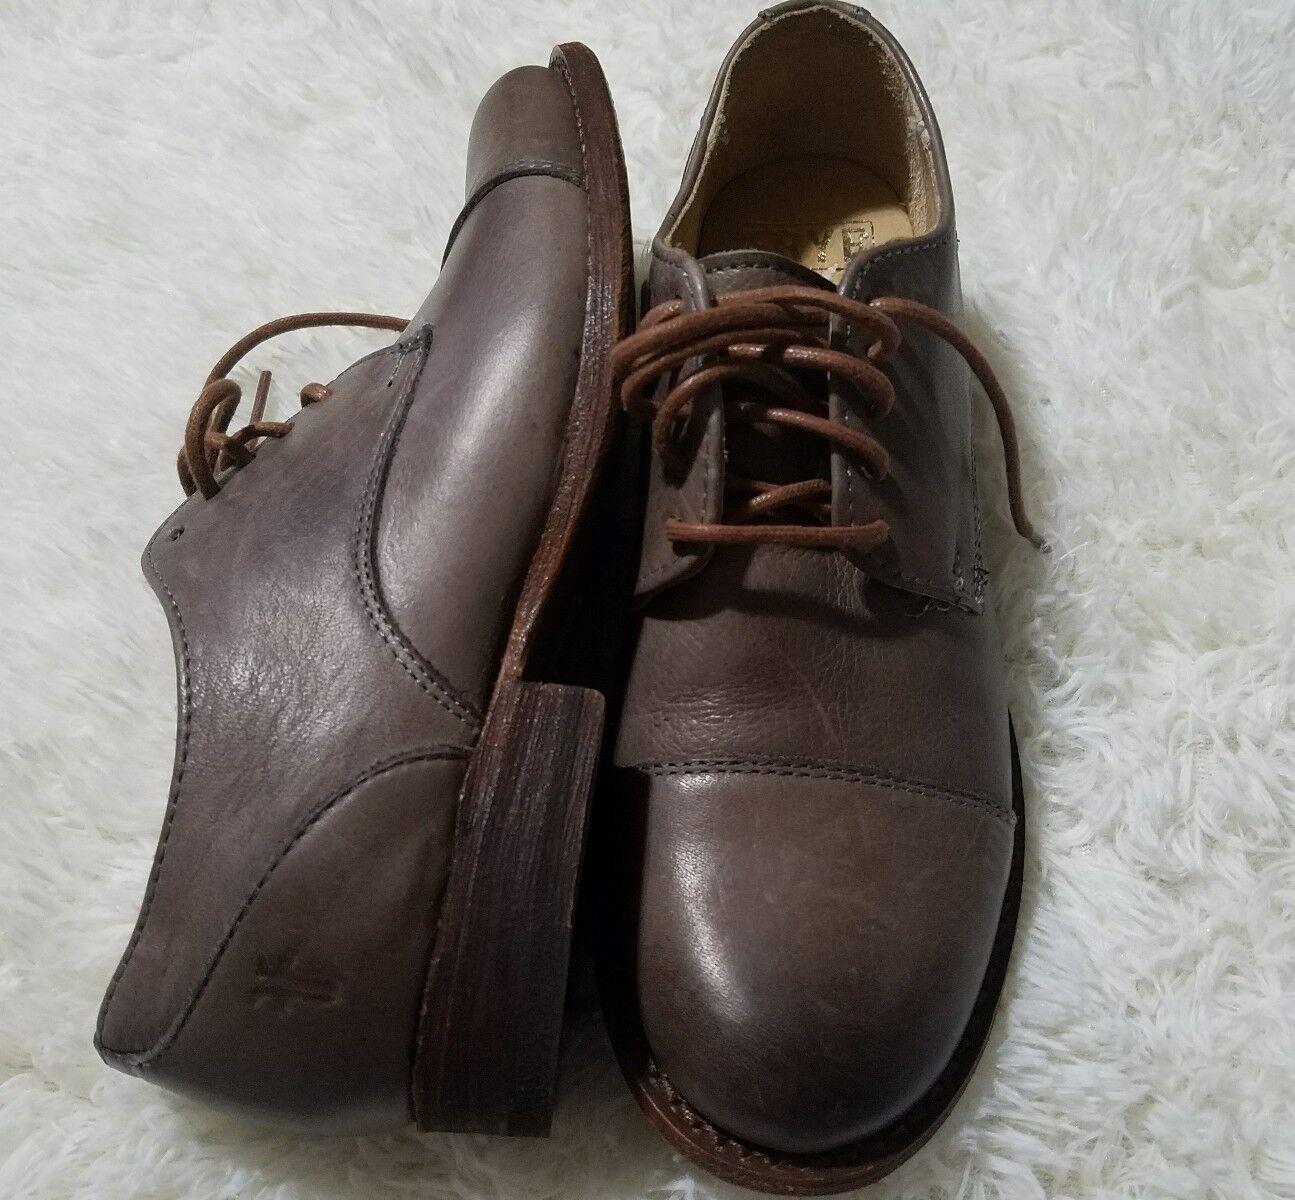 Frye Femmes Marron Cuir Derbies Chaussures Taille 5.5B NEUF